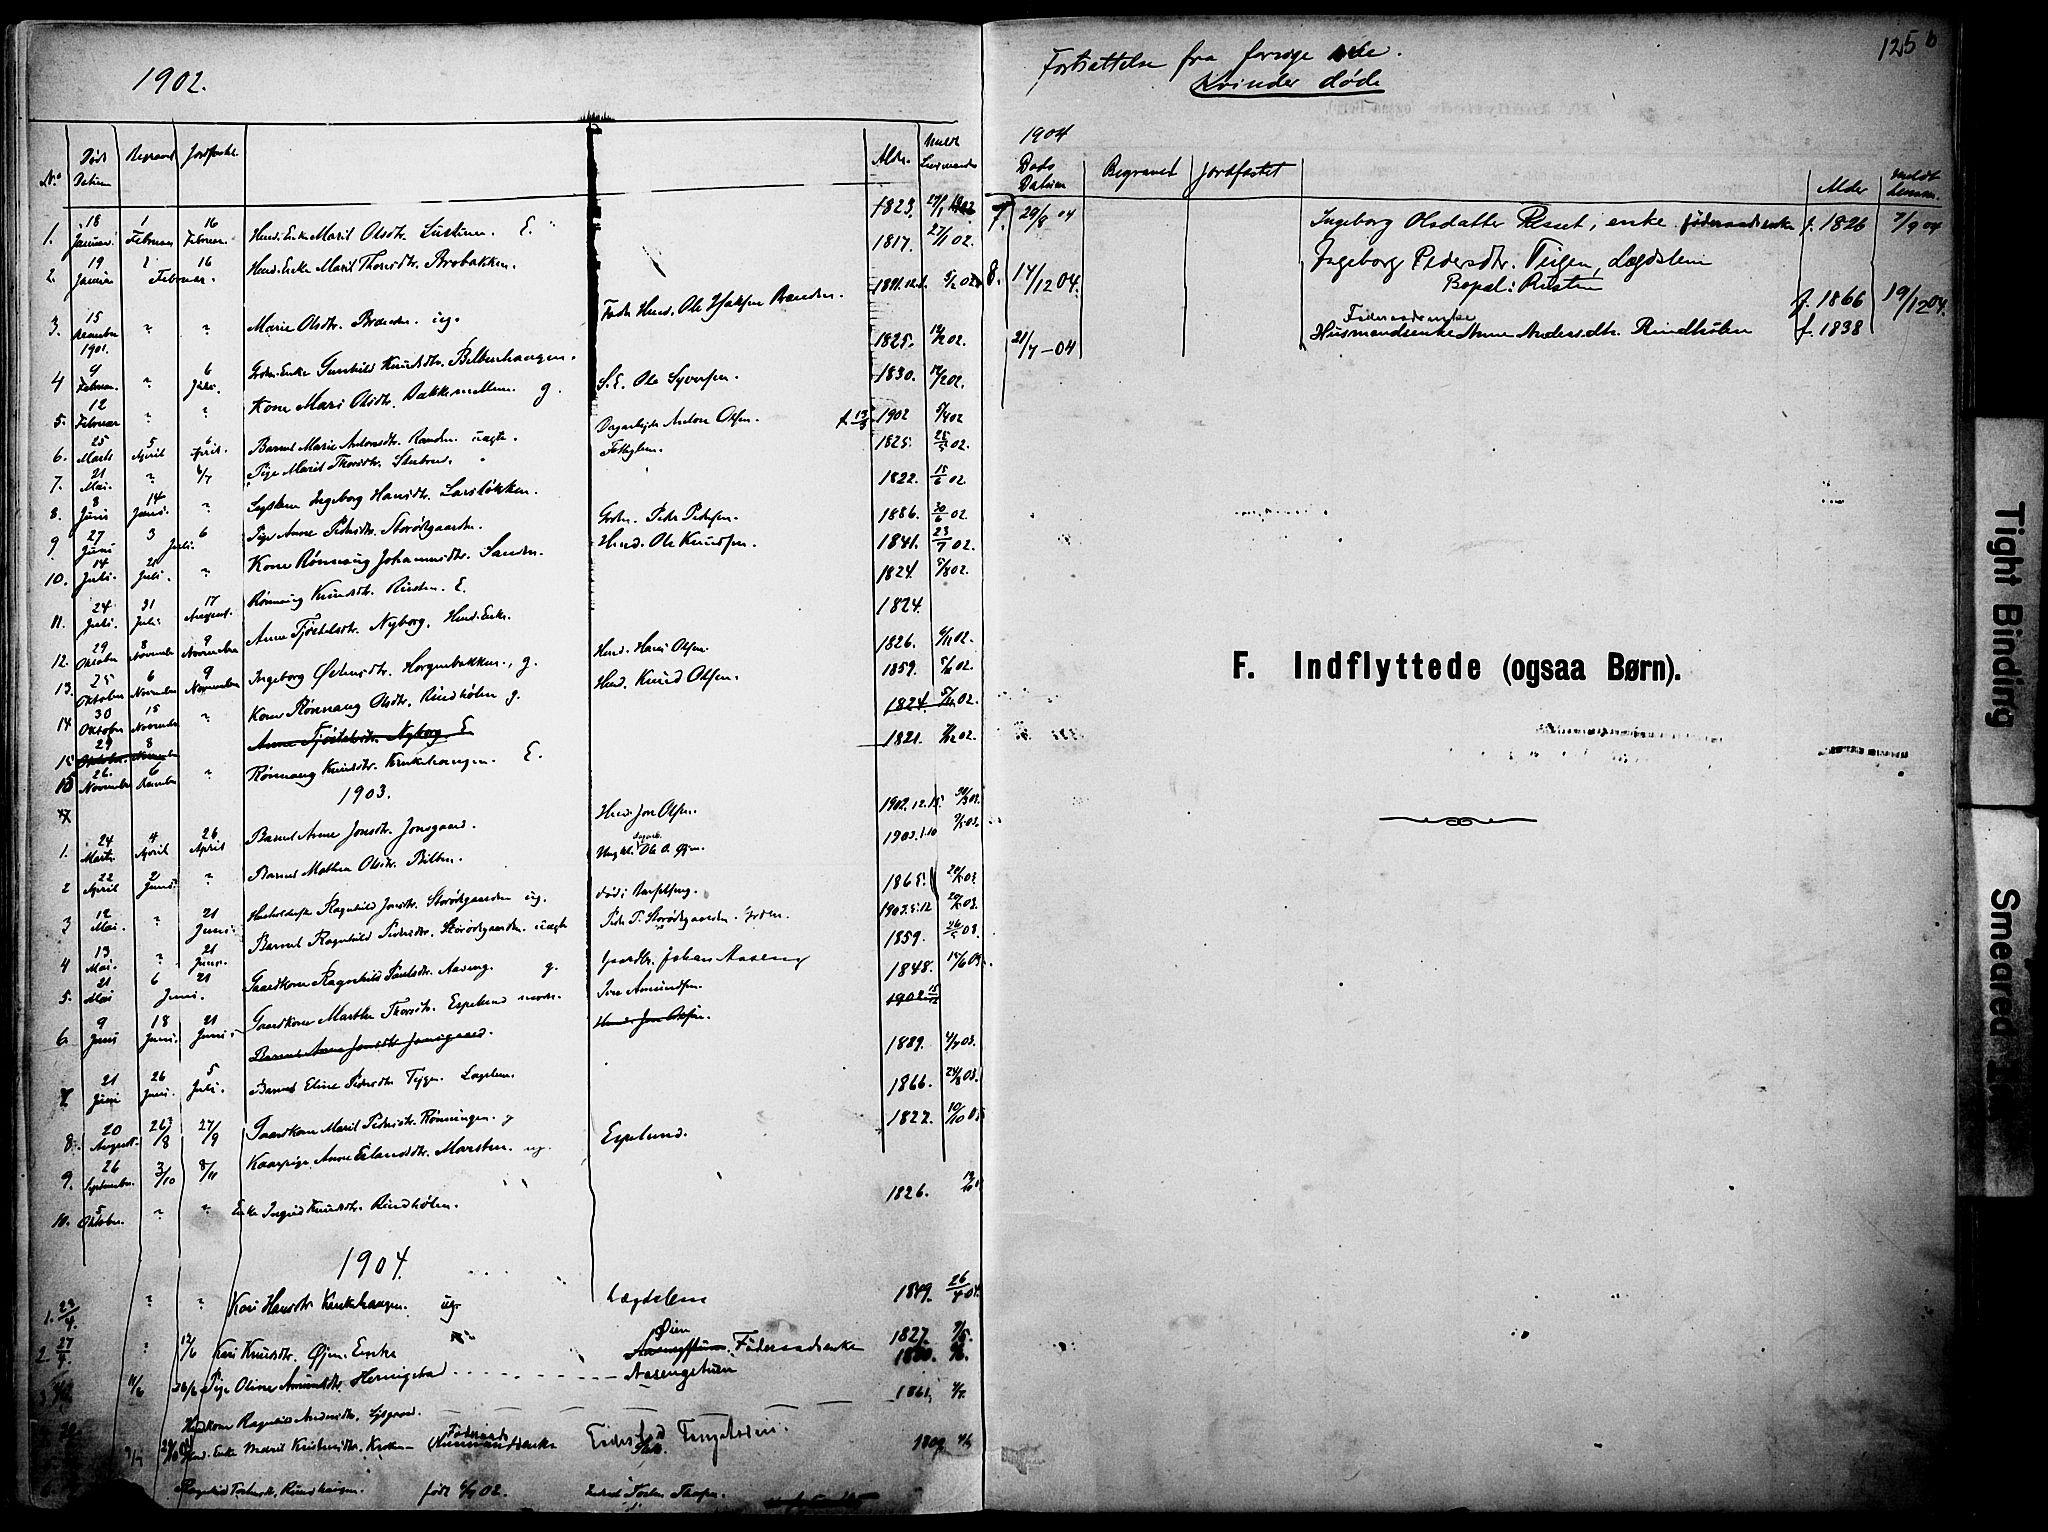 SAH, Vågå prestekontor, Ministerialbok nr. 10, 1887-1904, s. 125b